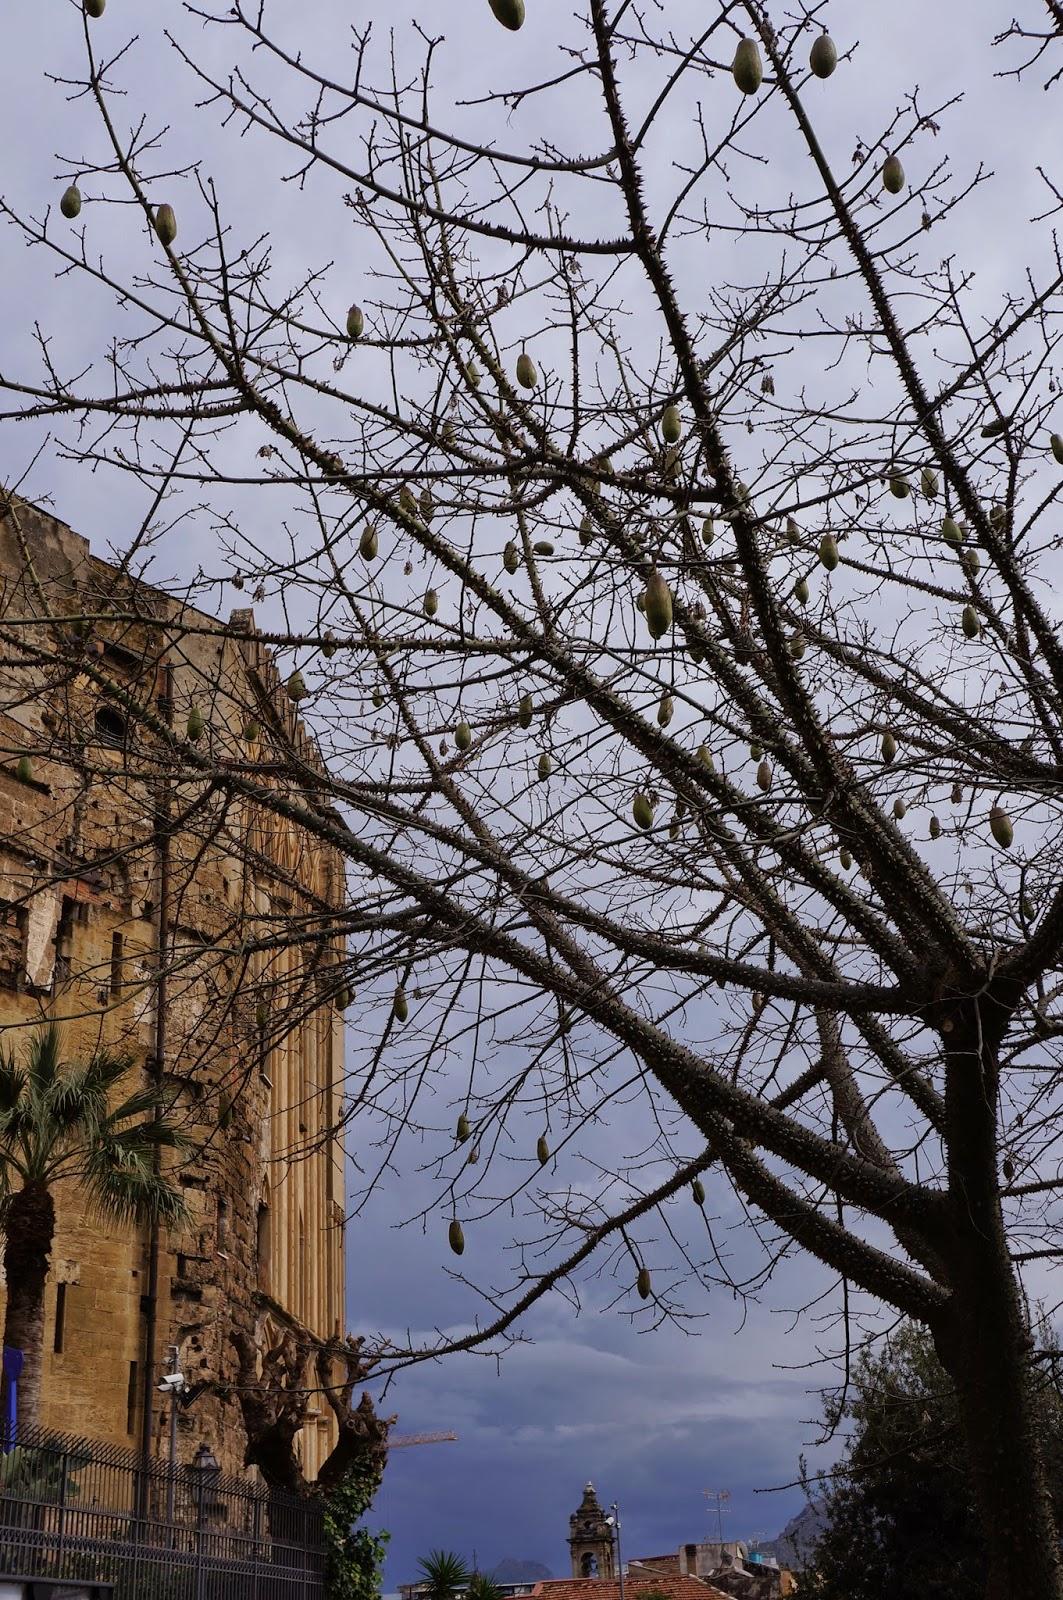 Same Ceiba speciosa or Ceiba pentandra tree with dried fruits in early spring